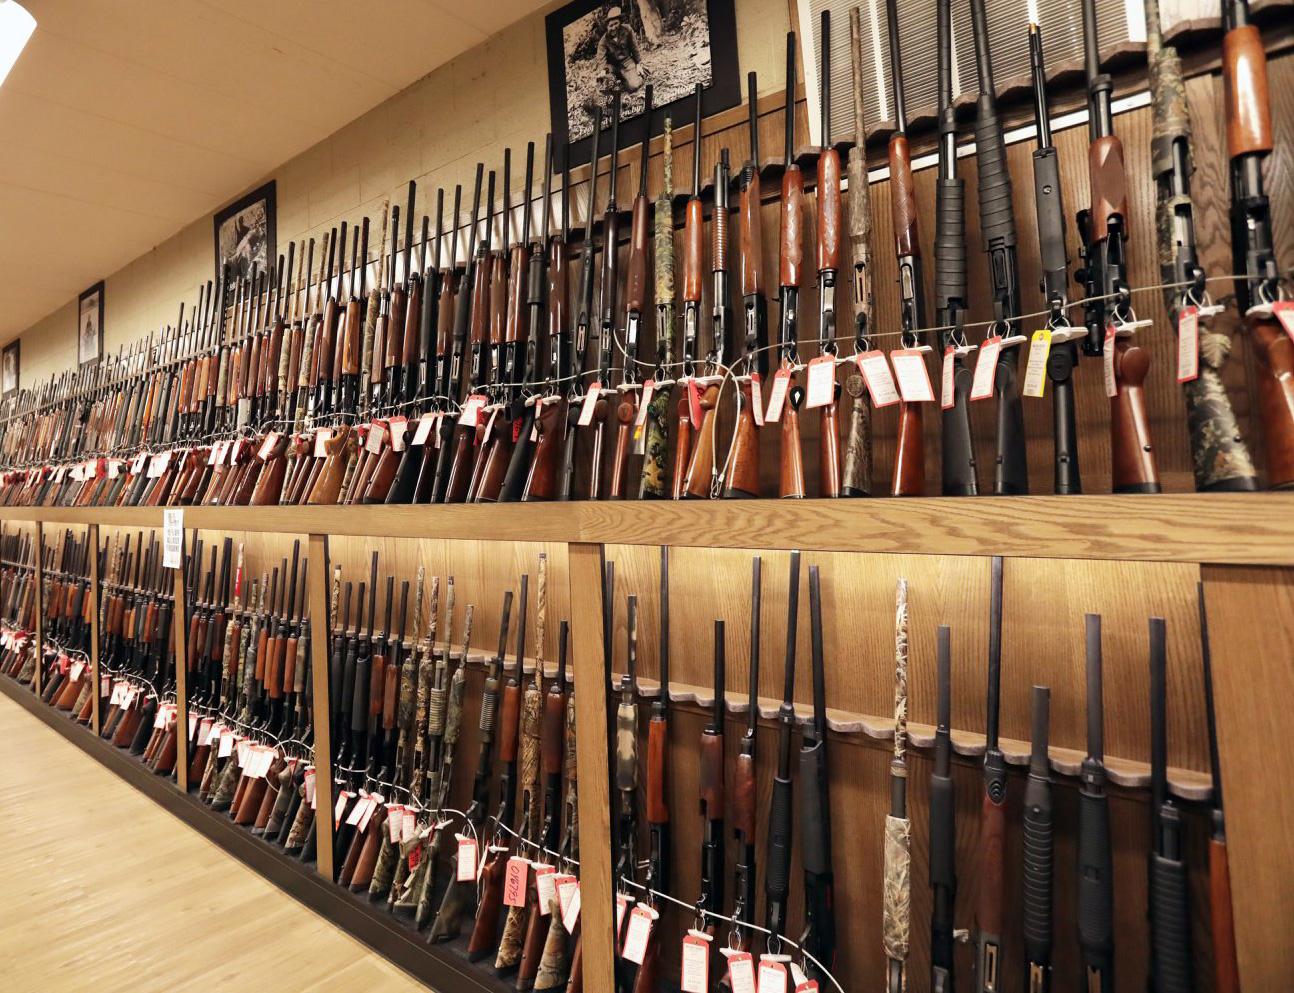 Shotguns Rifles